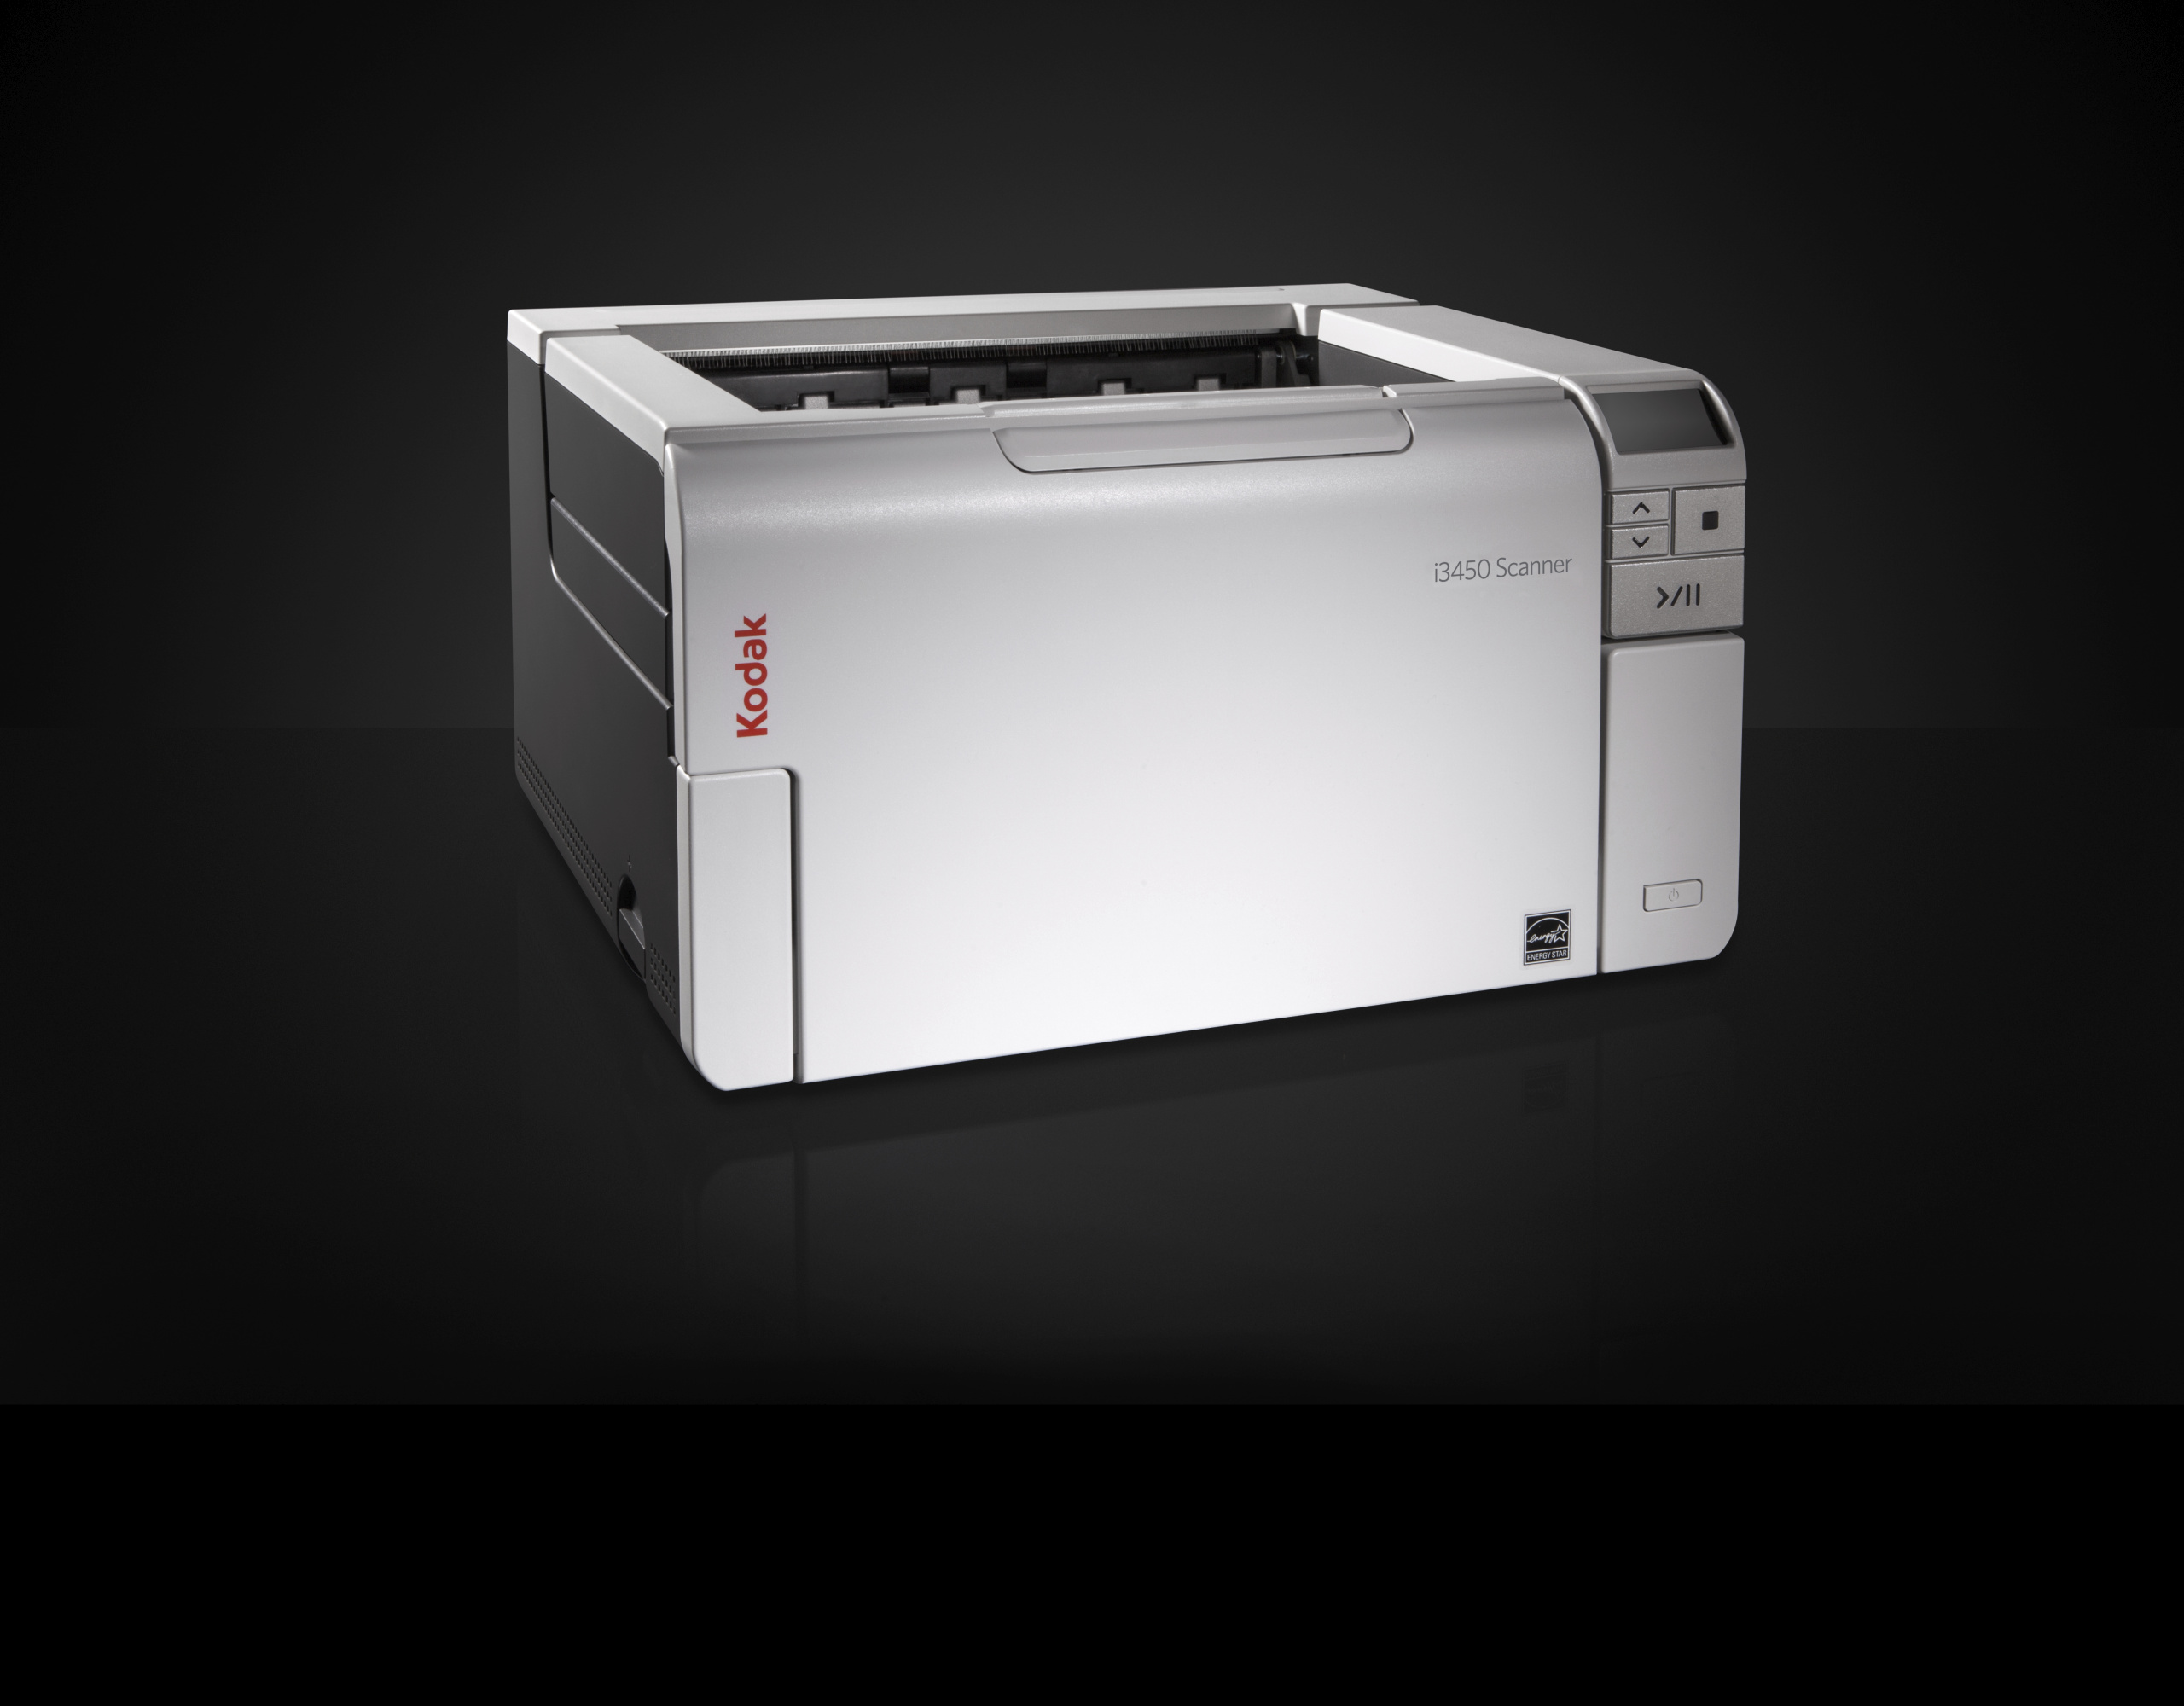 Product hero, hero, product shot, i3450 Scanner, i3450 hero photography